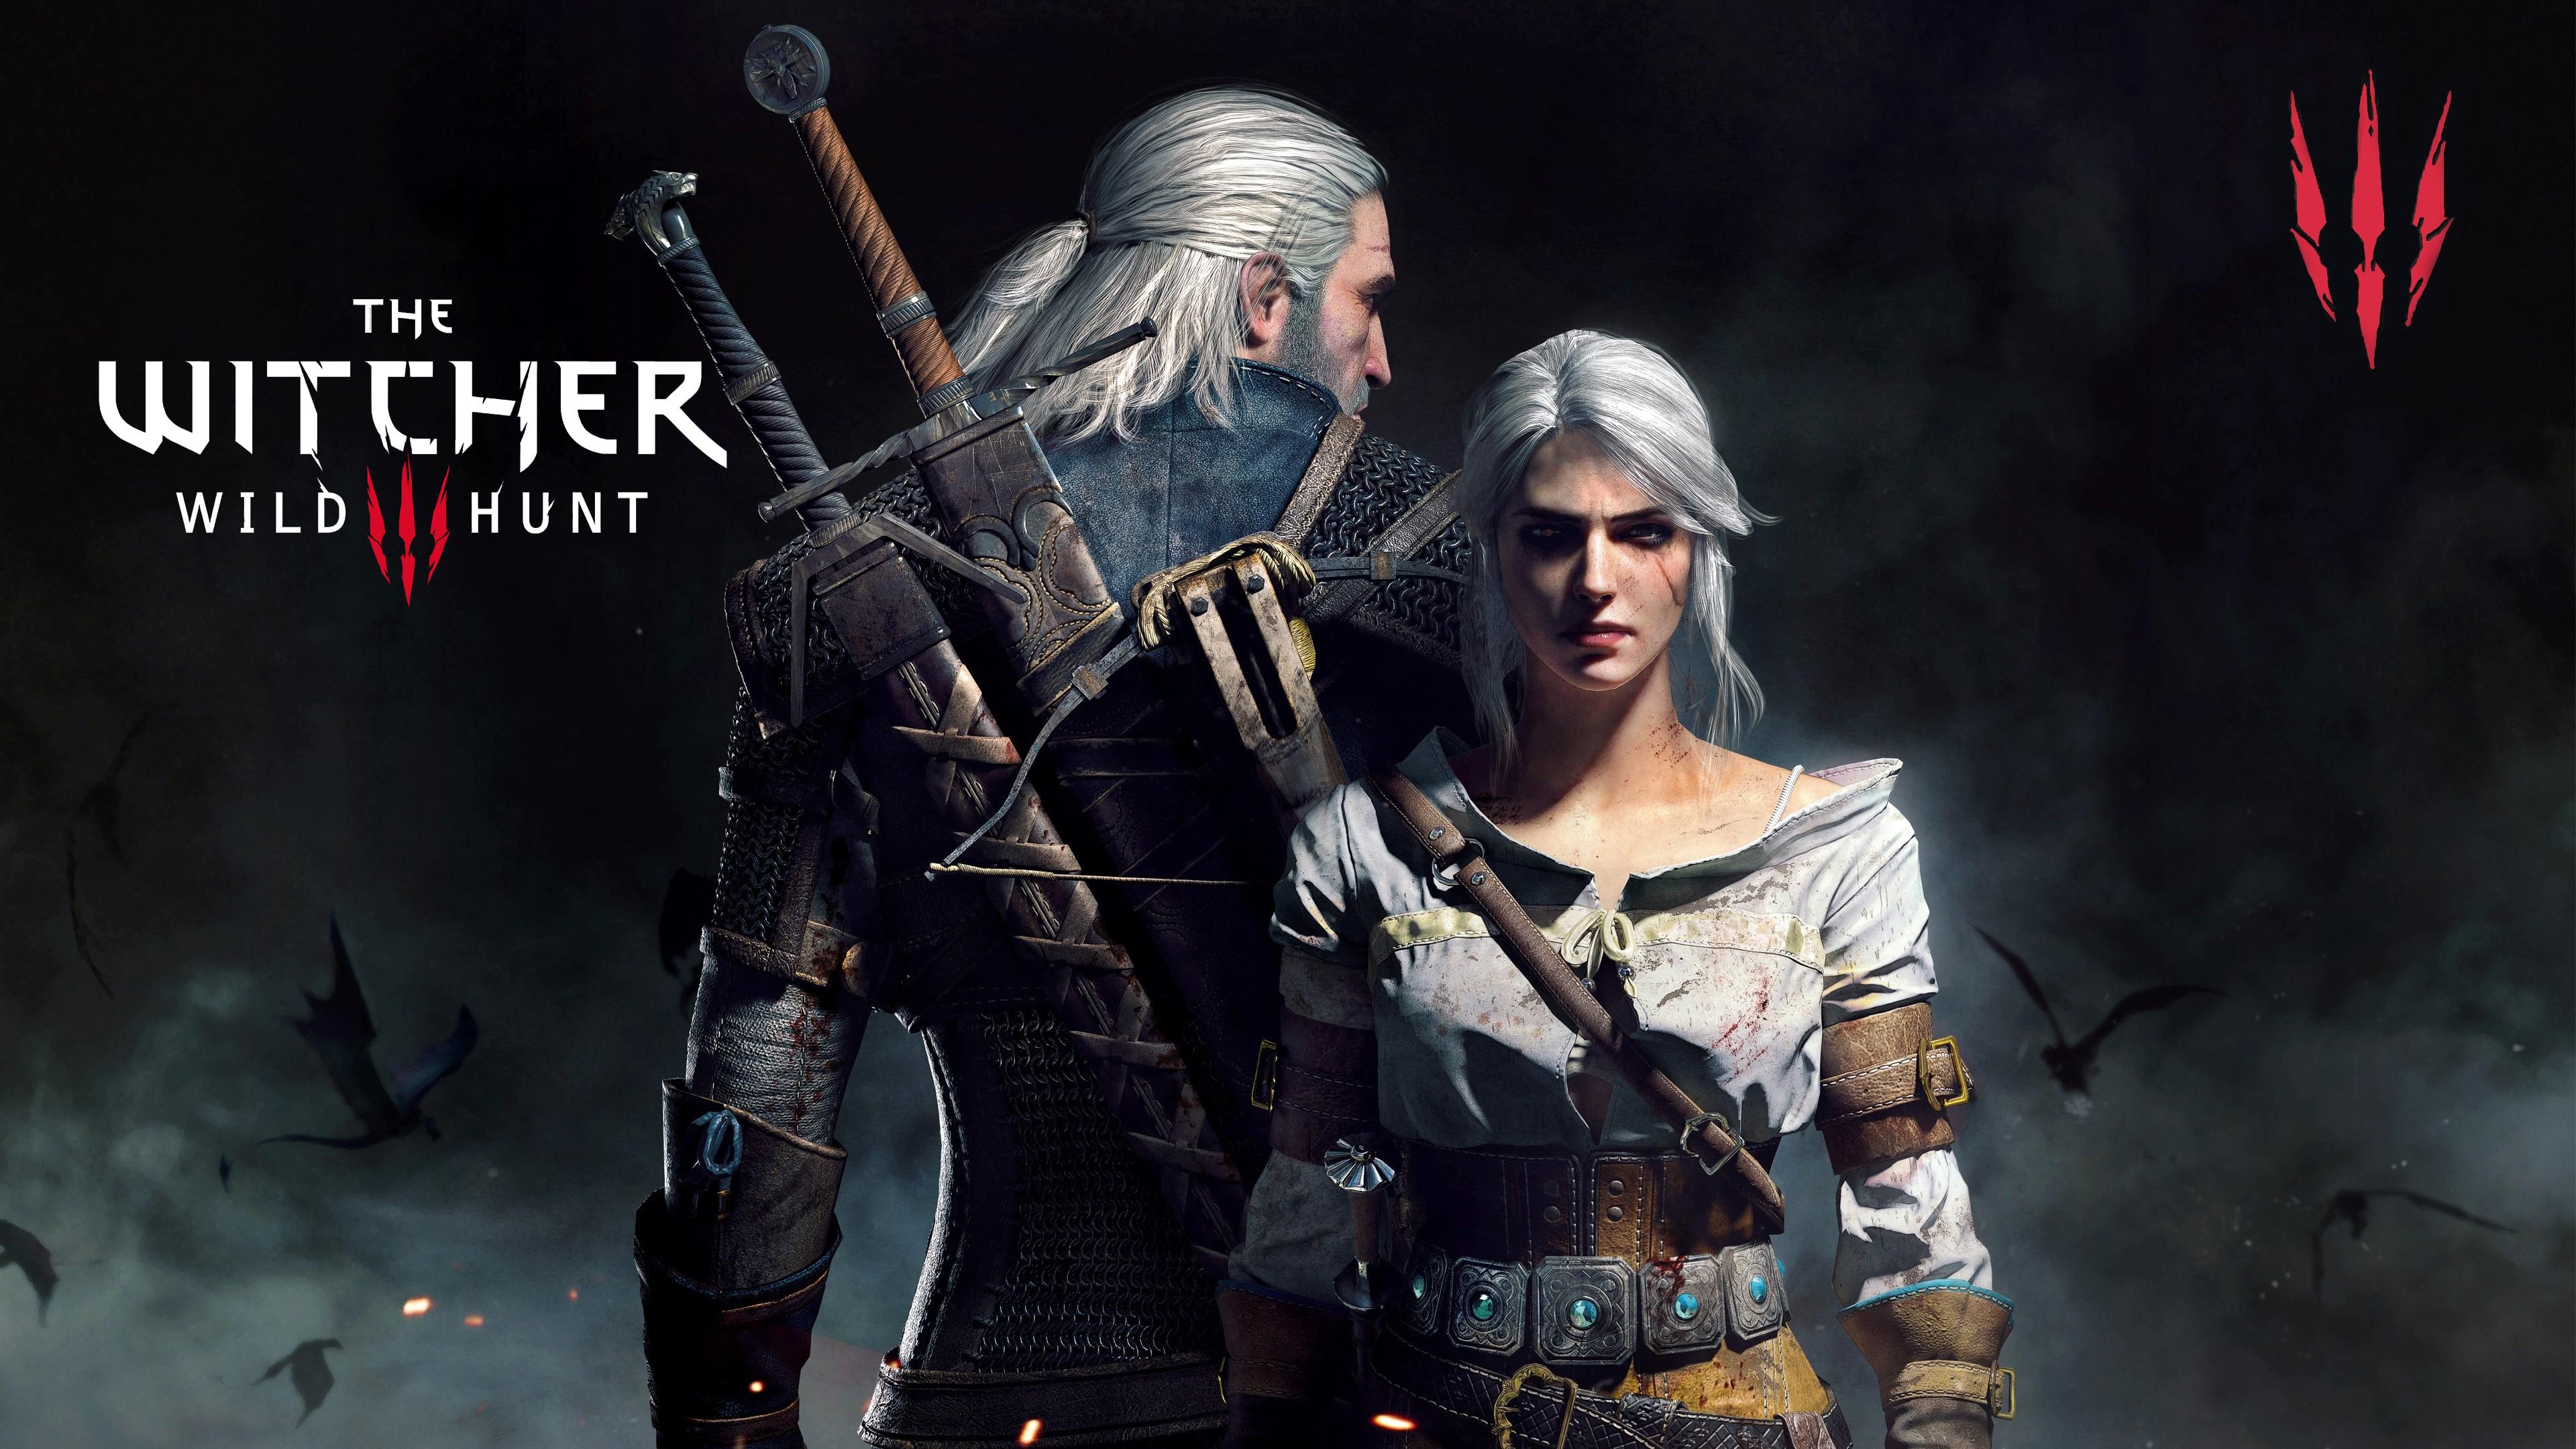 General 3840x2160 The Witcher 3: Wild Hunt Geralt of Rivia Ciri Cirilla CD Projekt RED Cirilla Fiona Elen Riannon Andrzej Sapkowski